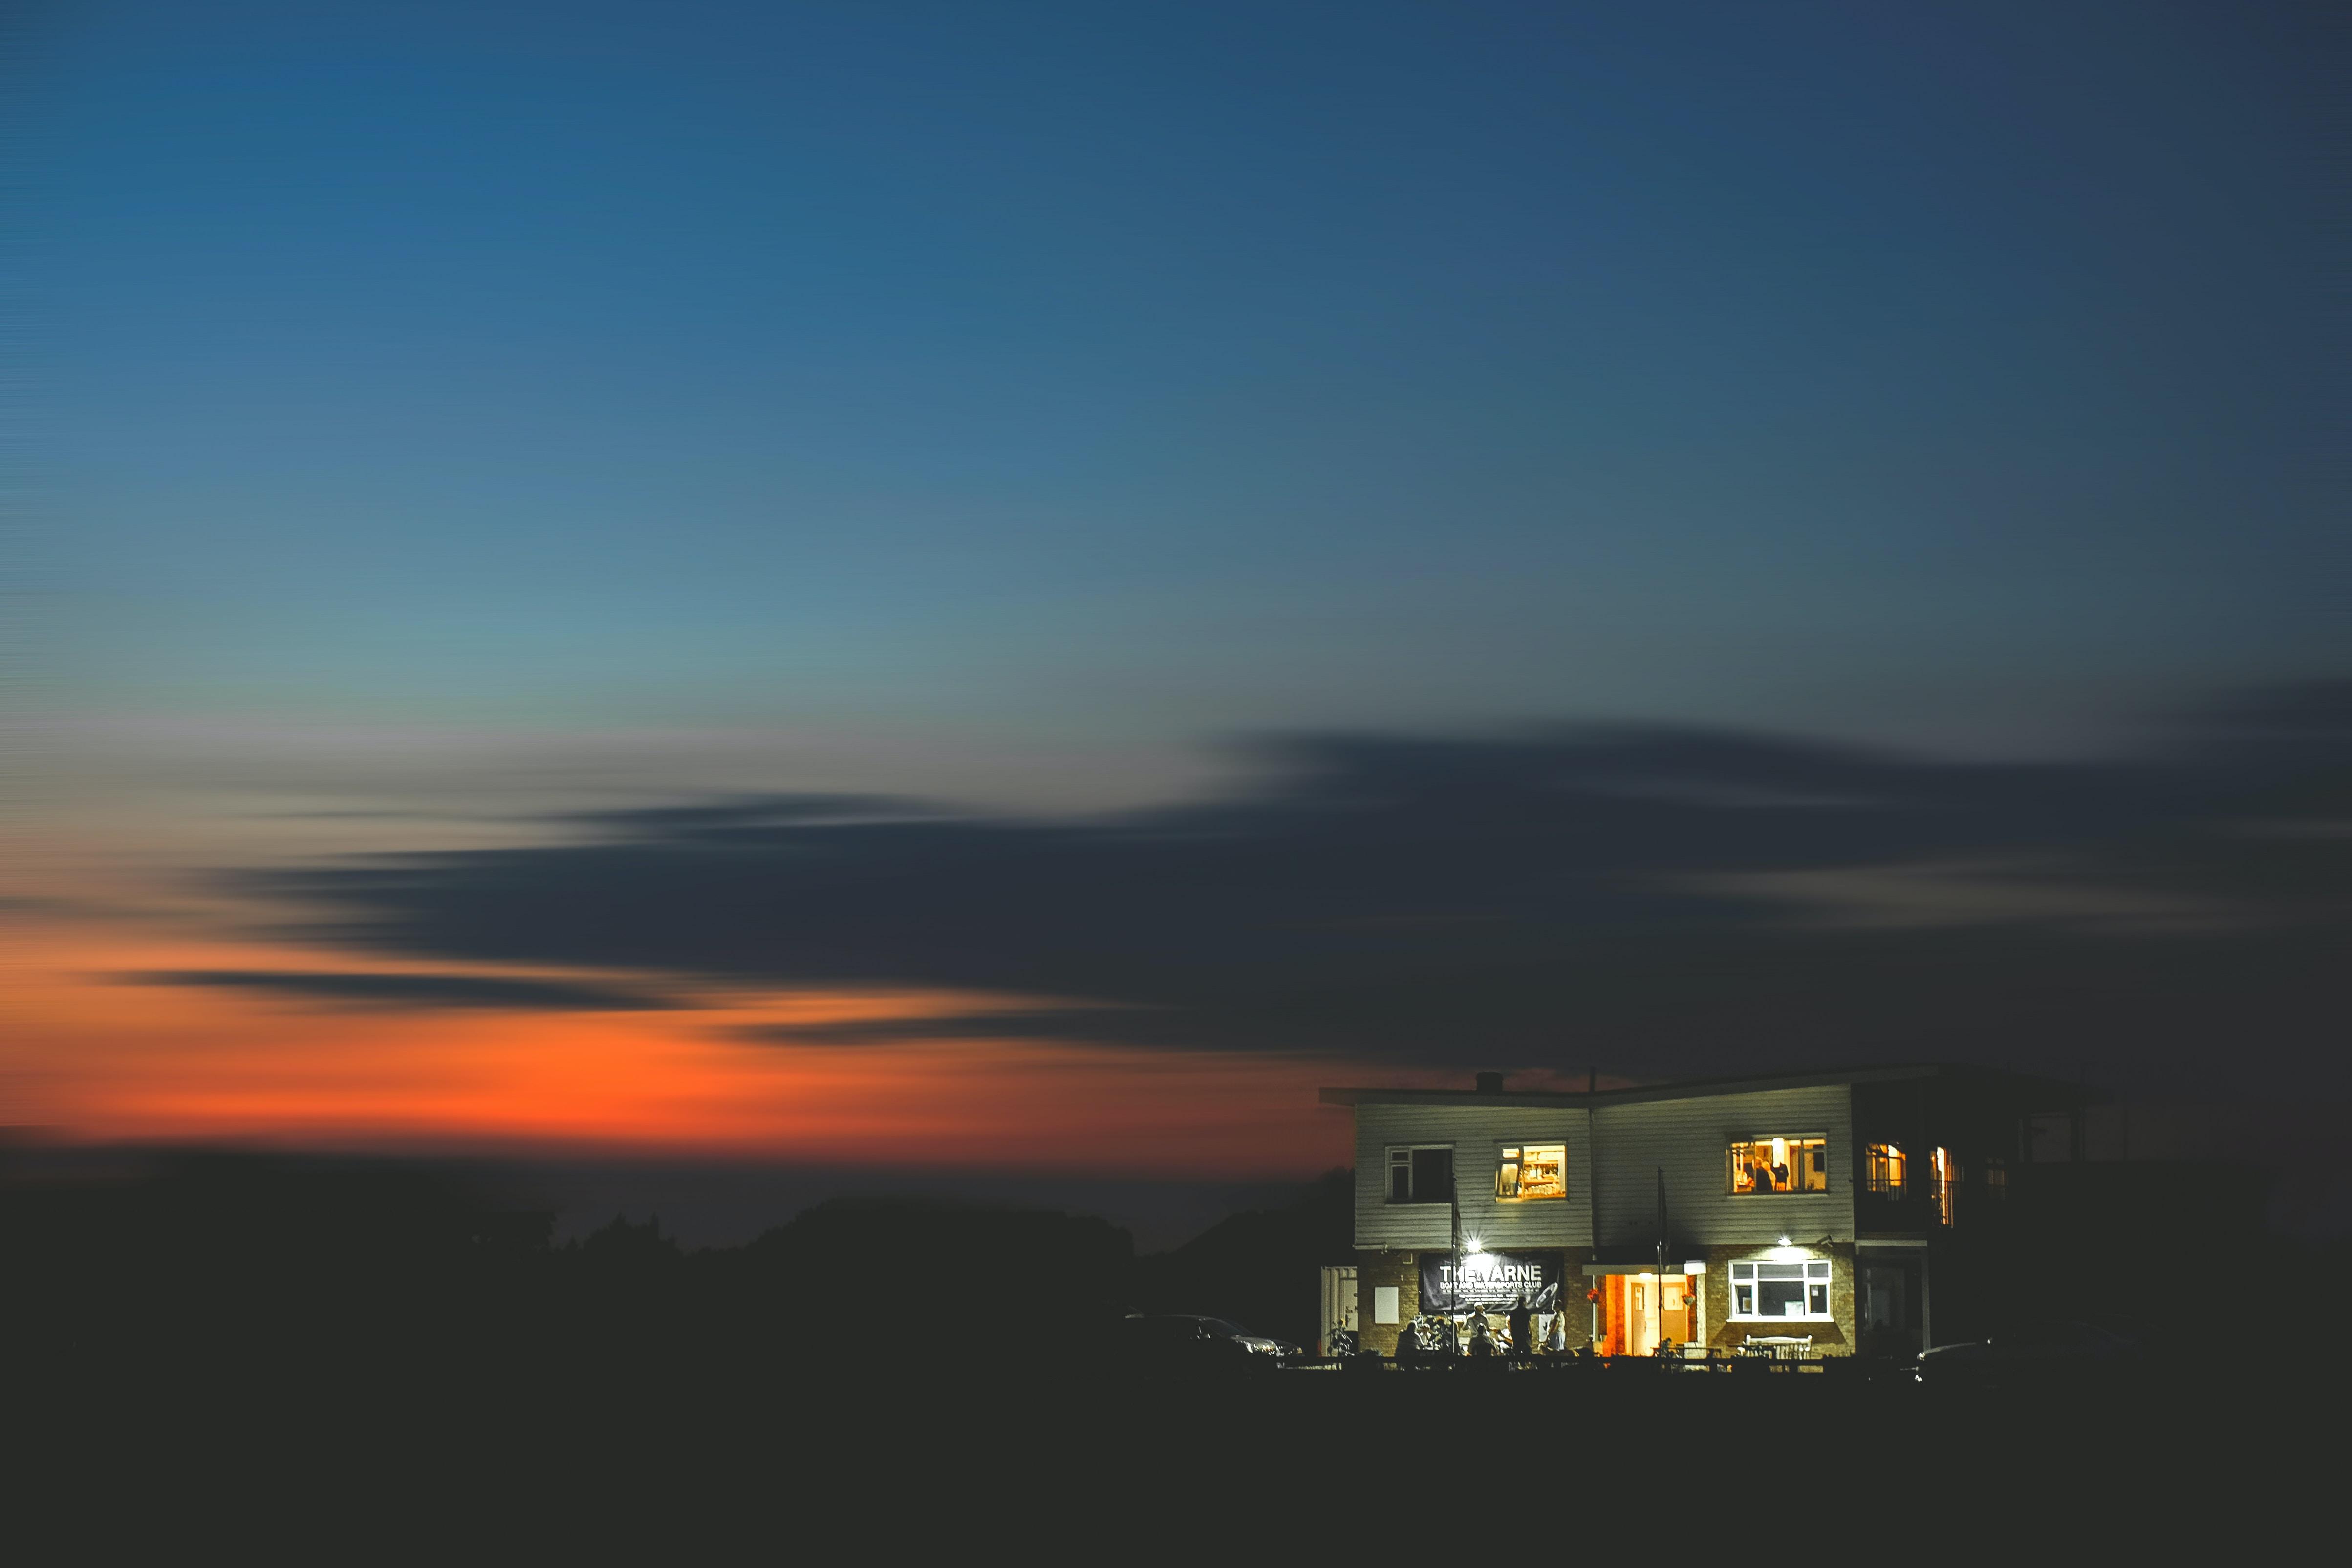 white lighted house during sunset